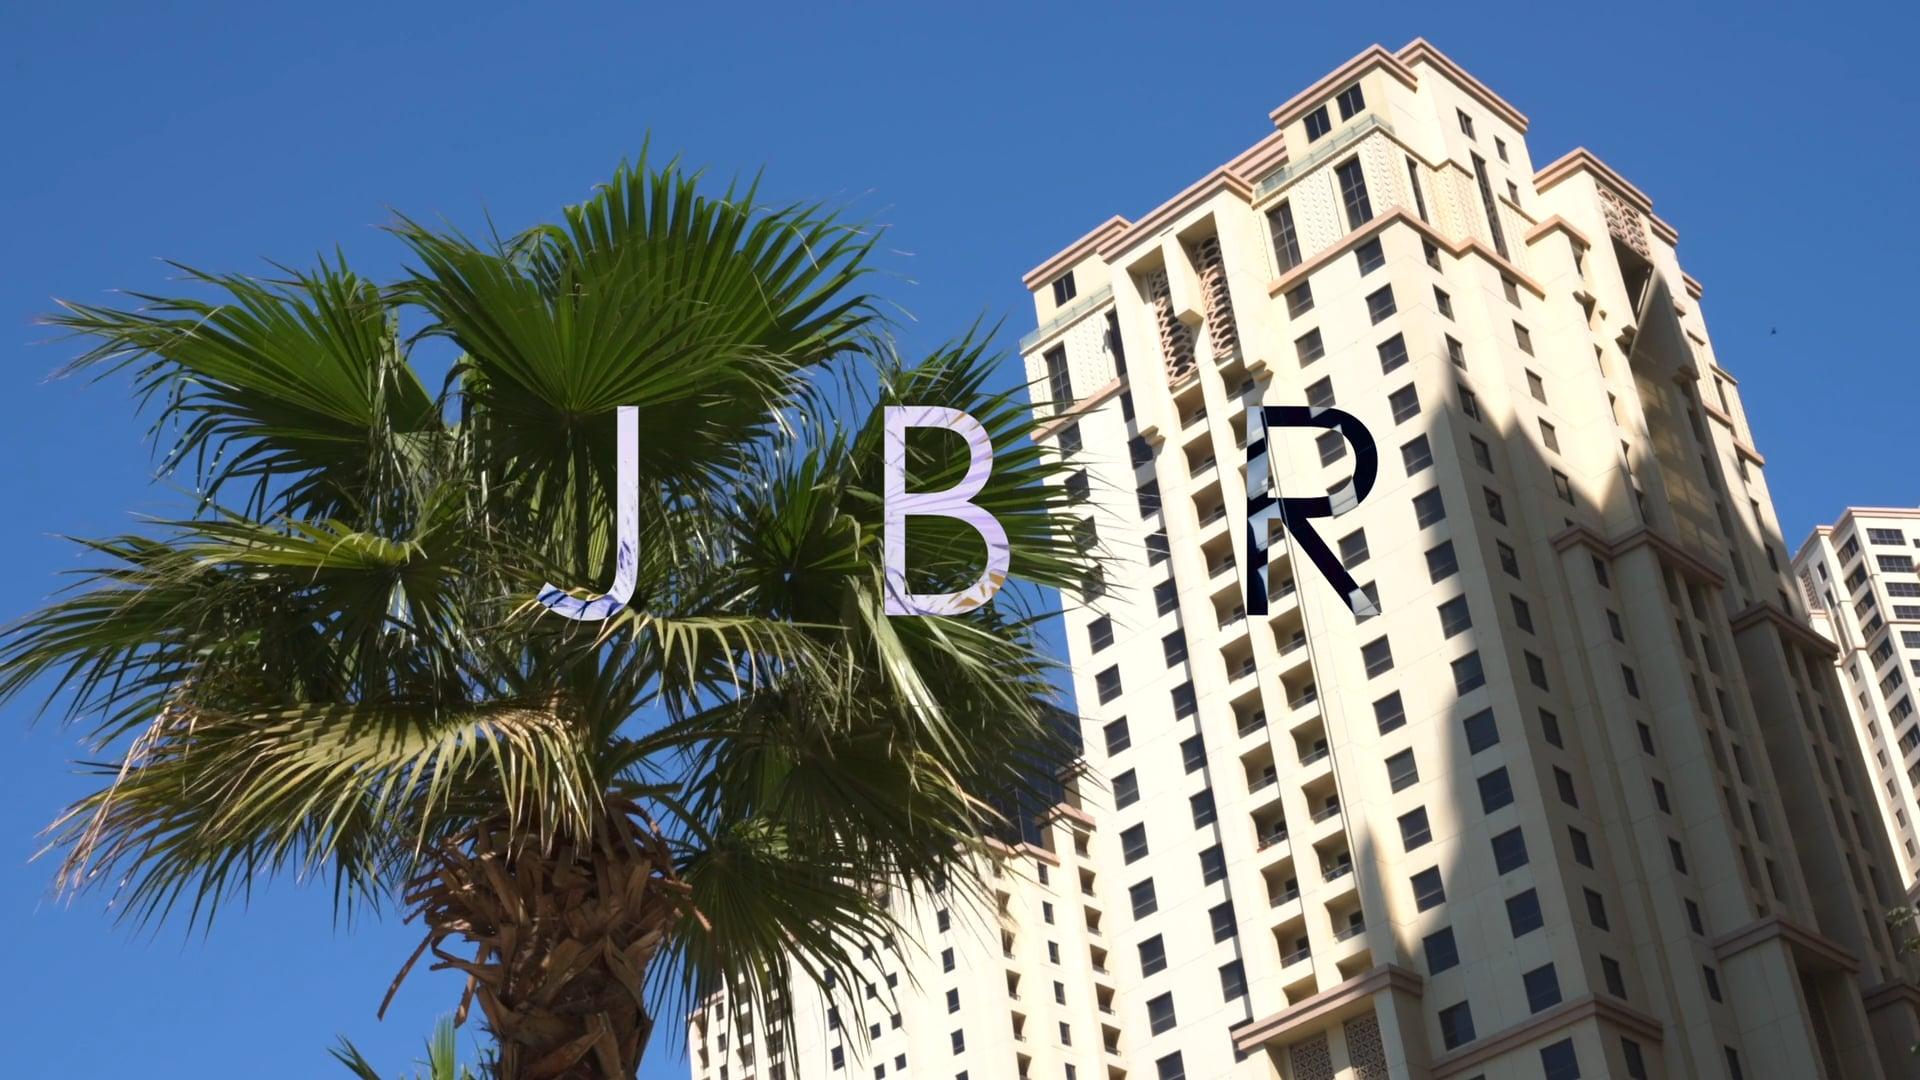 Dubai In 4k   JBR / Jumeirah Beach Residence